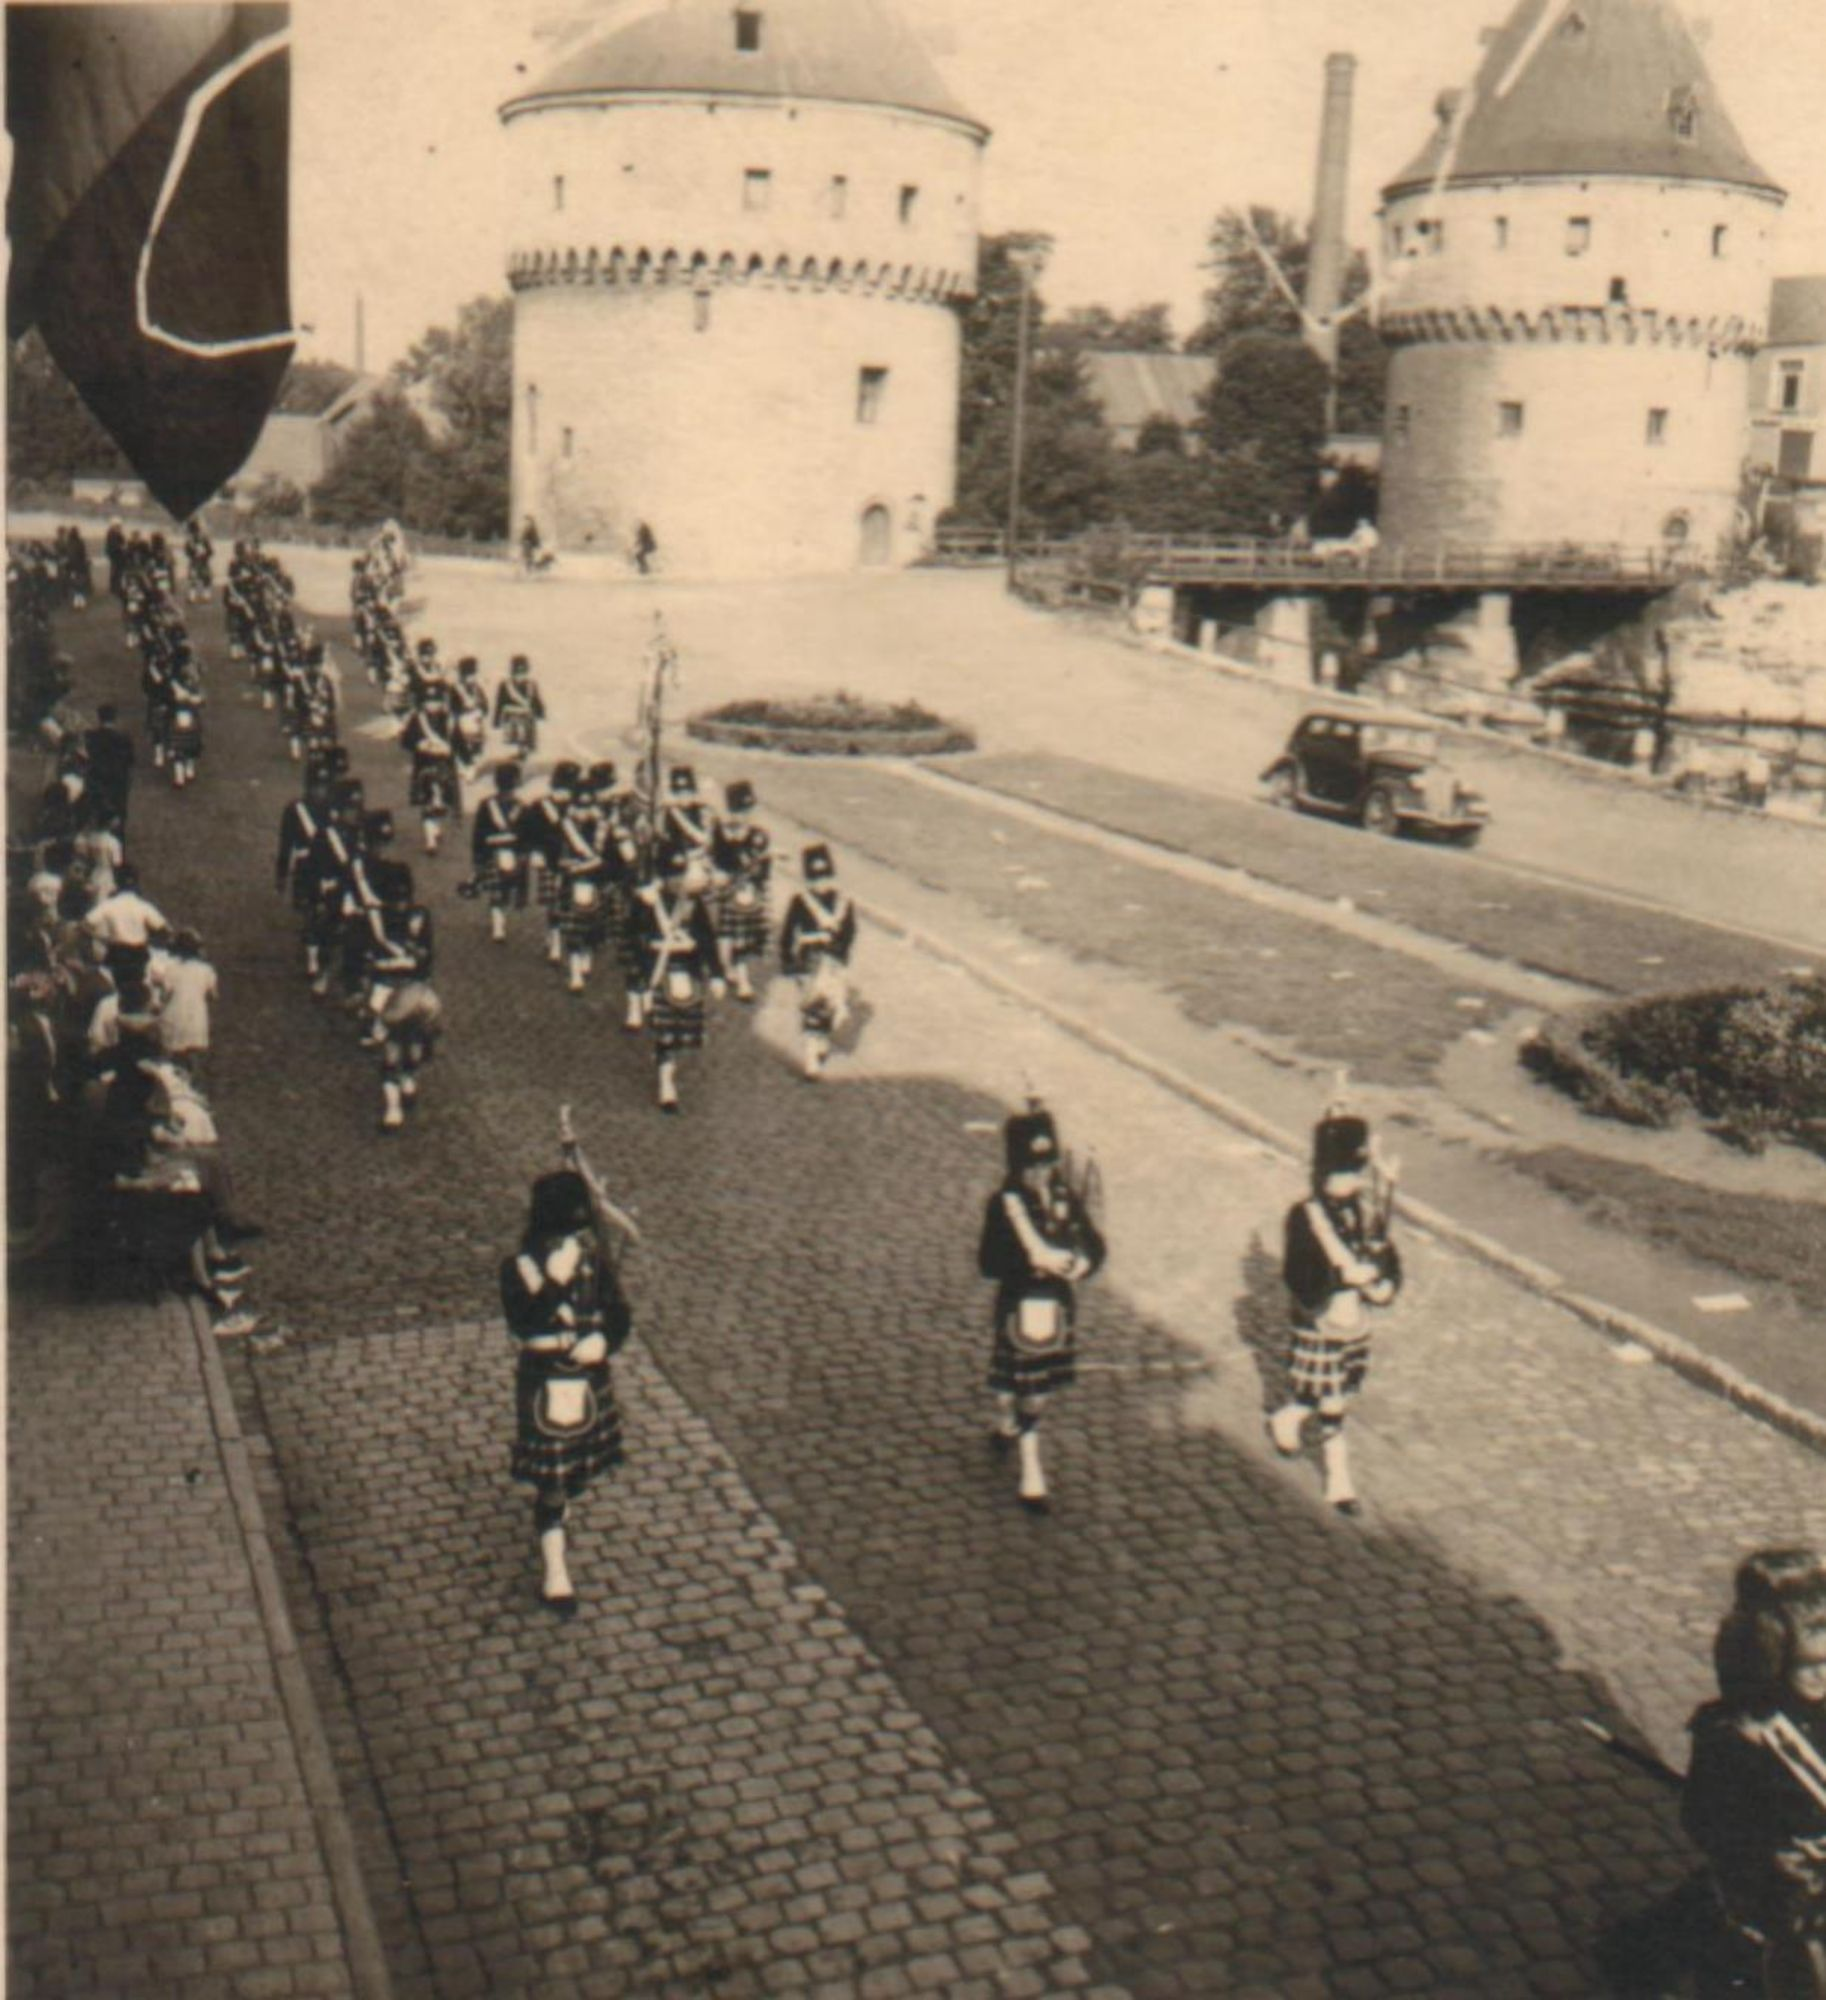 Carnaval stoet zomer 1948 of 1948.